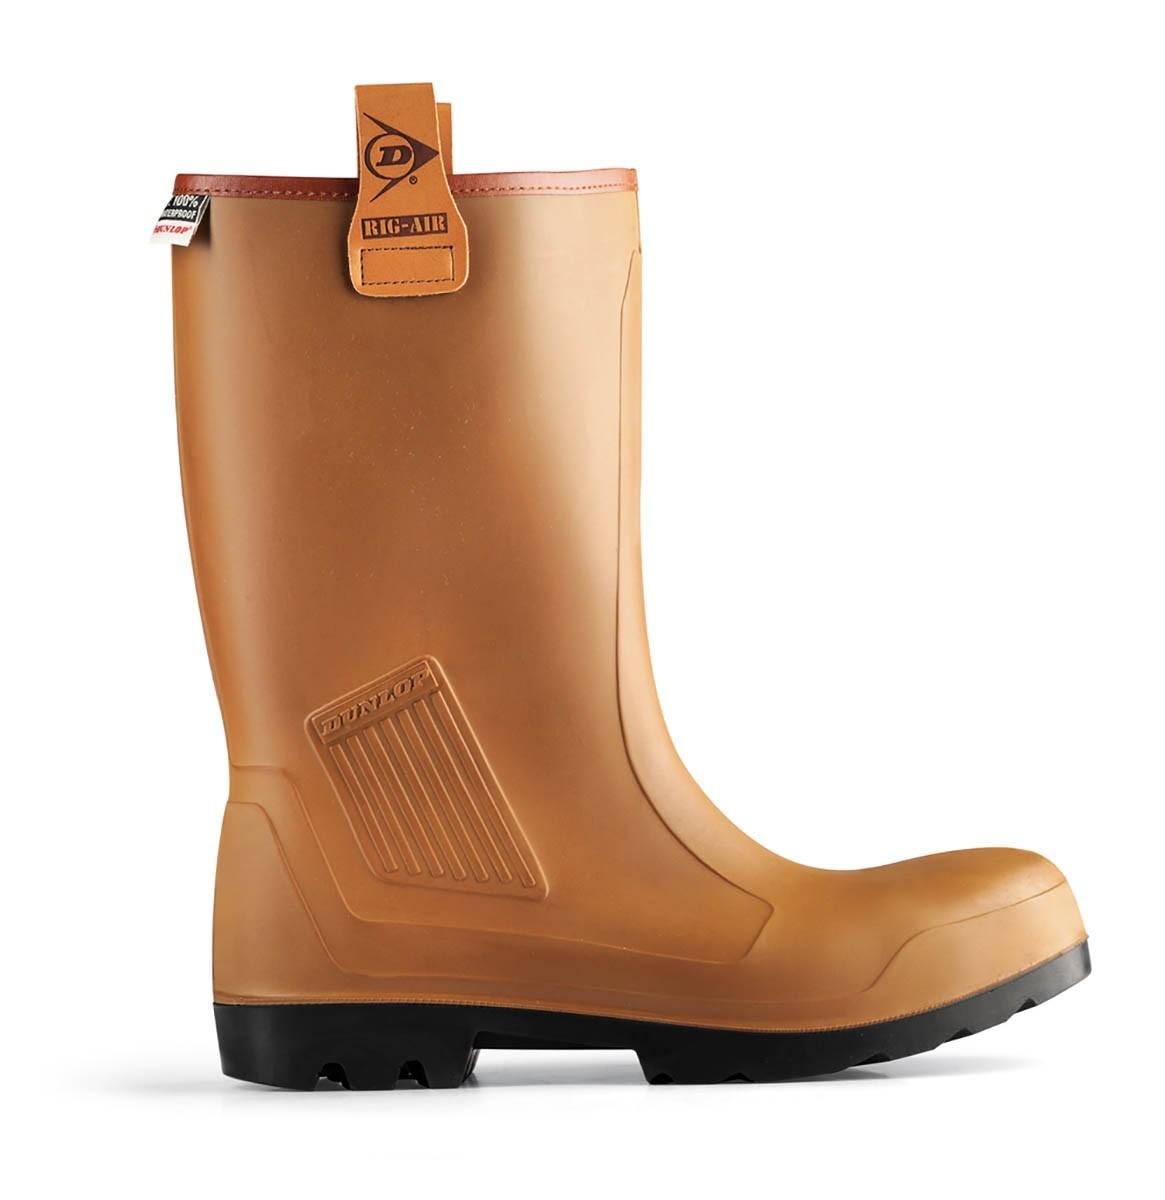 B-Dri Dunlop Purofort Waterproof Safety Rigger Boot C462743